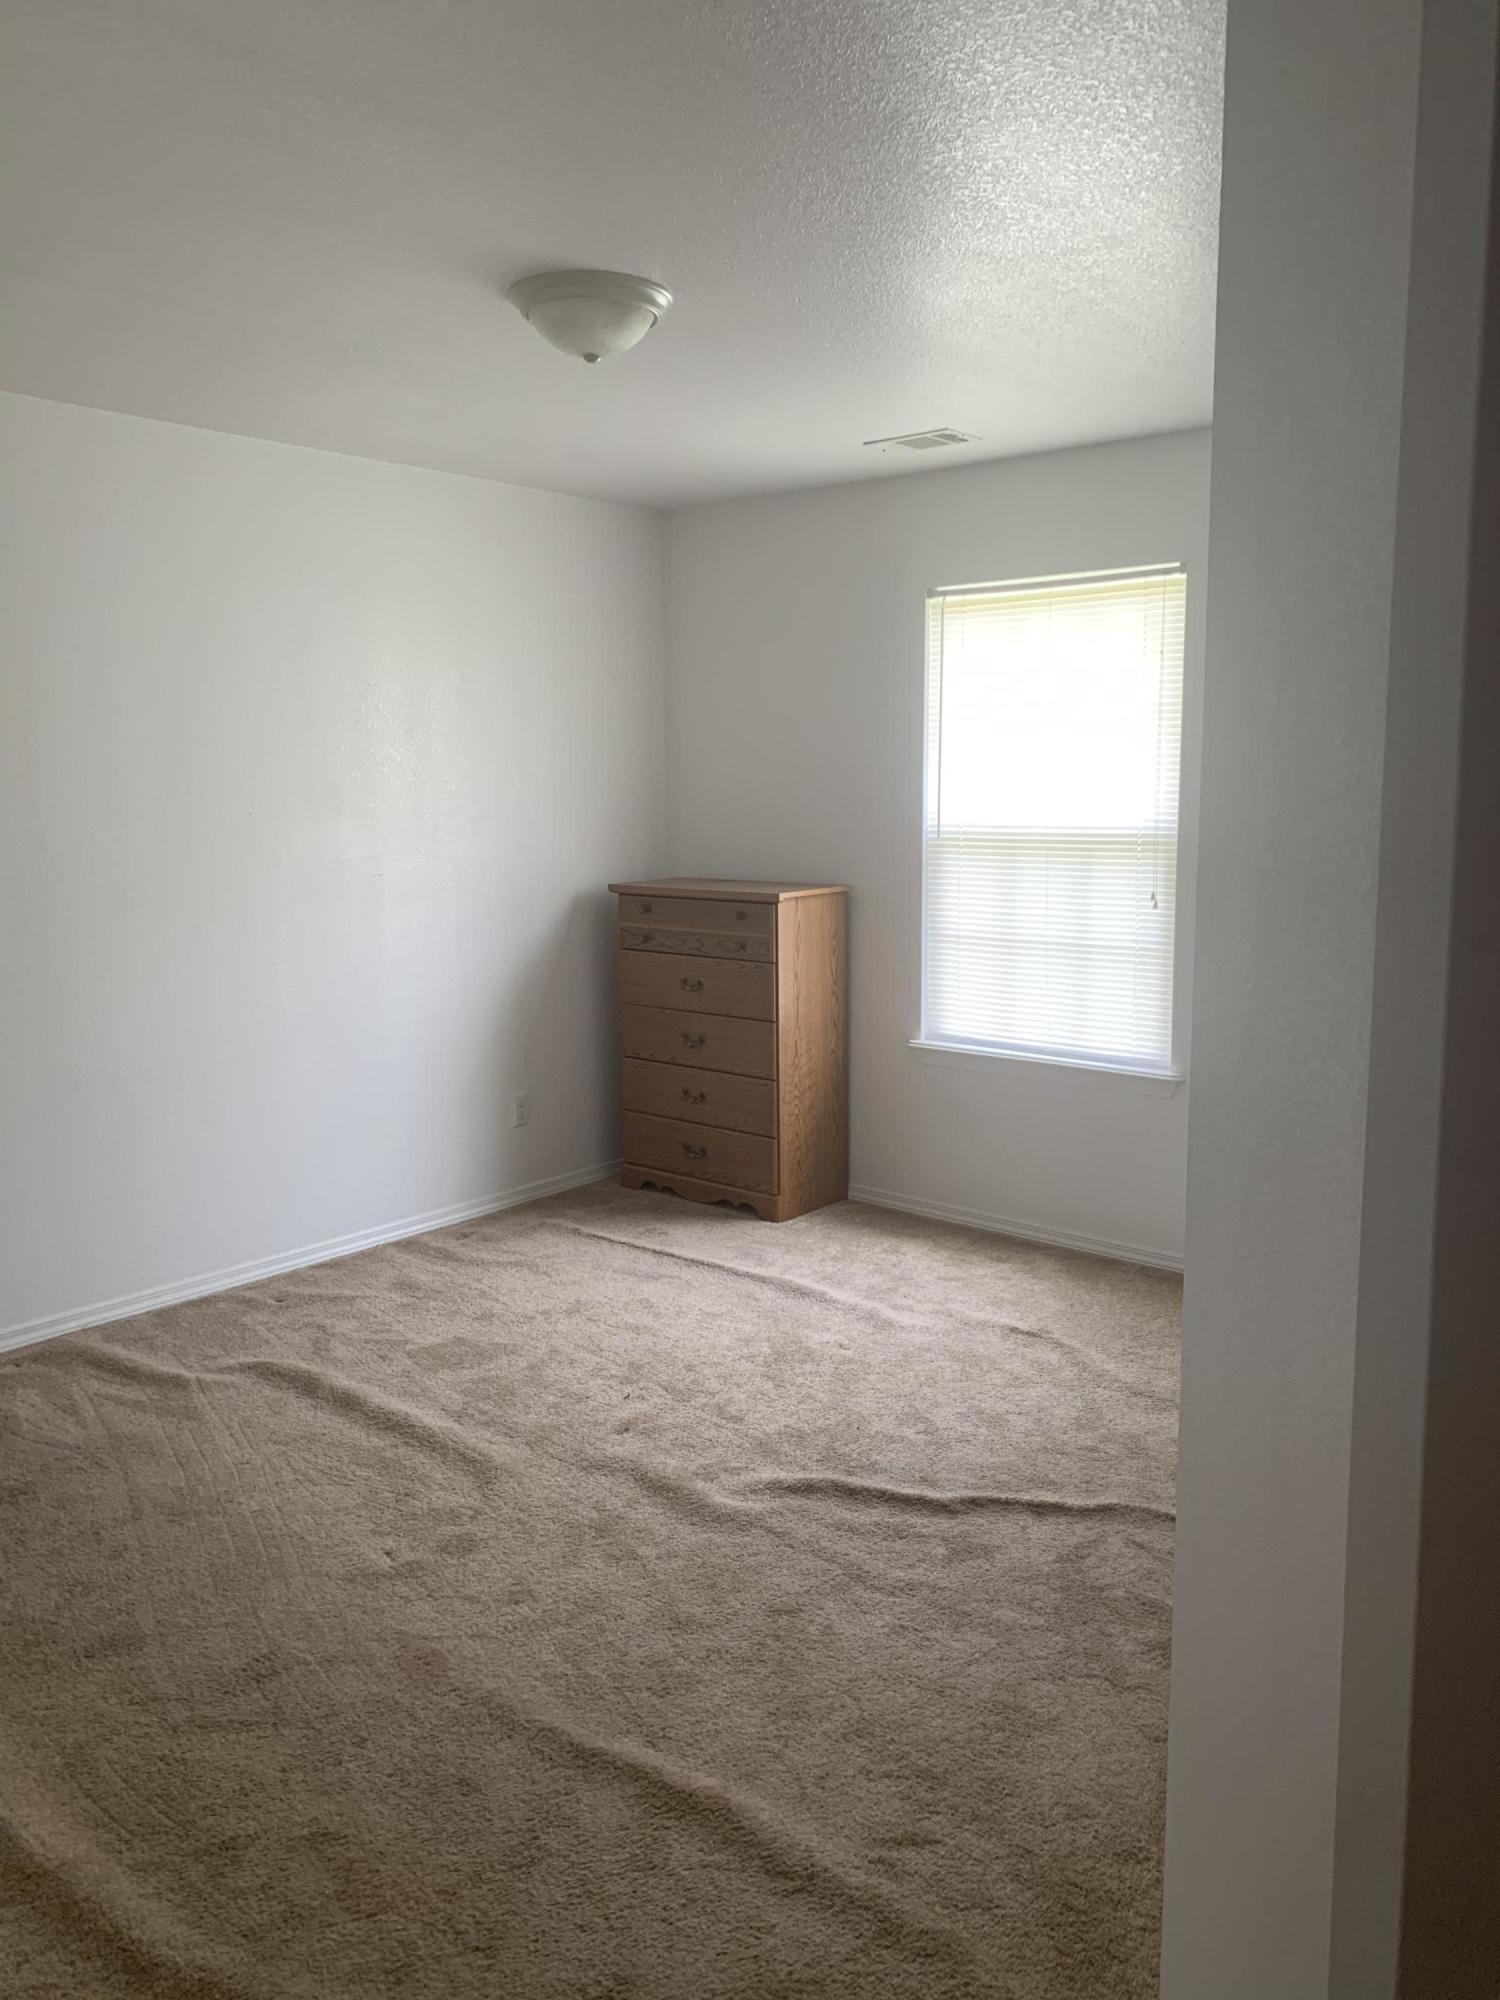 Large photo 8 of Lamar home for sale at 124 Cedarwood Drive, Lamar, AR